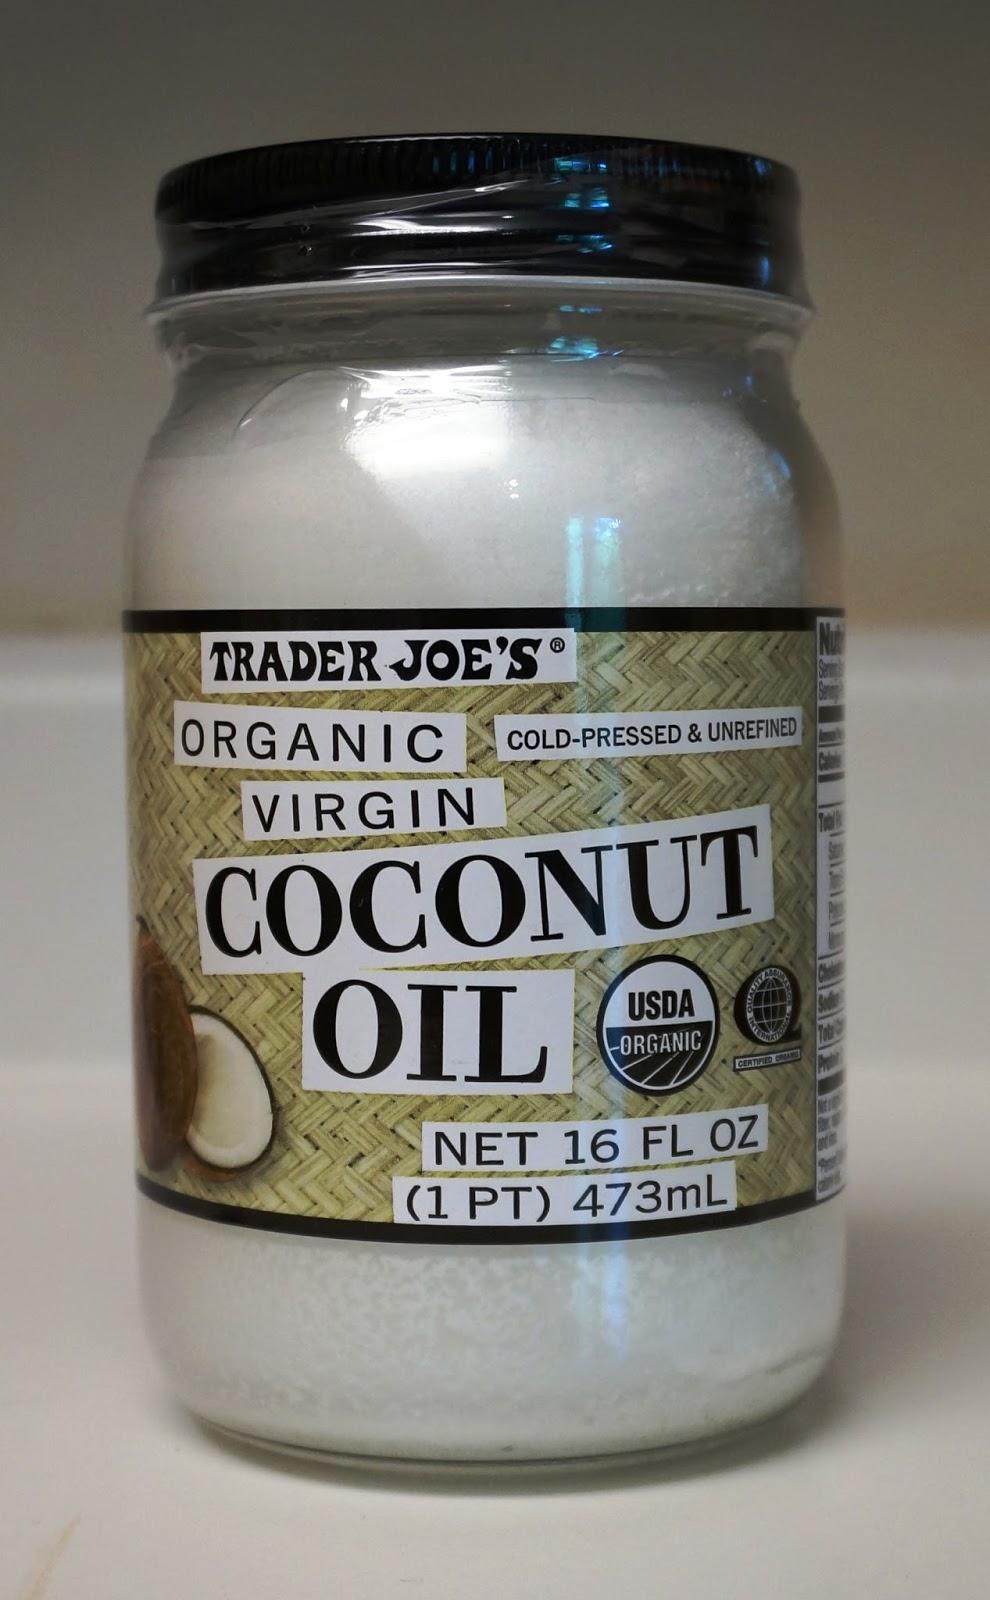 exploring trader joe 39 s trader joe 39 s organic virgin coconut oil. Black Bedroom Furniture Sets. Home Design Ideas